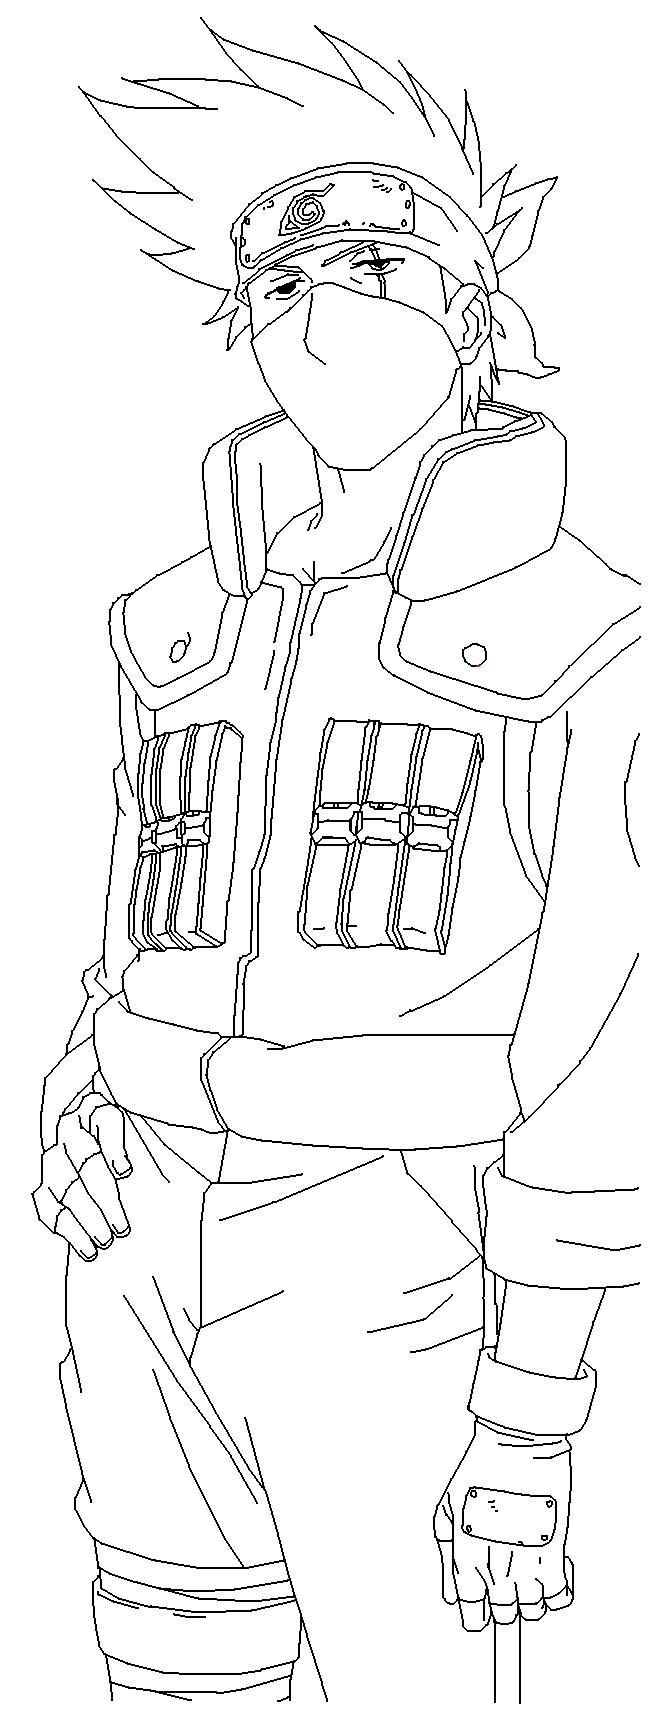 coloring page kakashi hatake kakashi hatake 9 coloring crafty kakashi hatake blank by usagisailormoon20 kakashi coloring